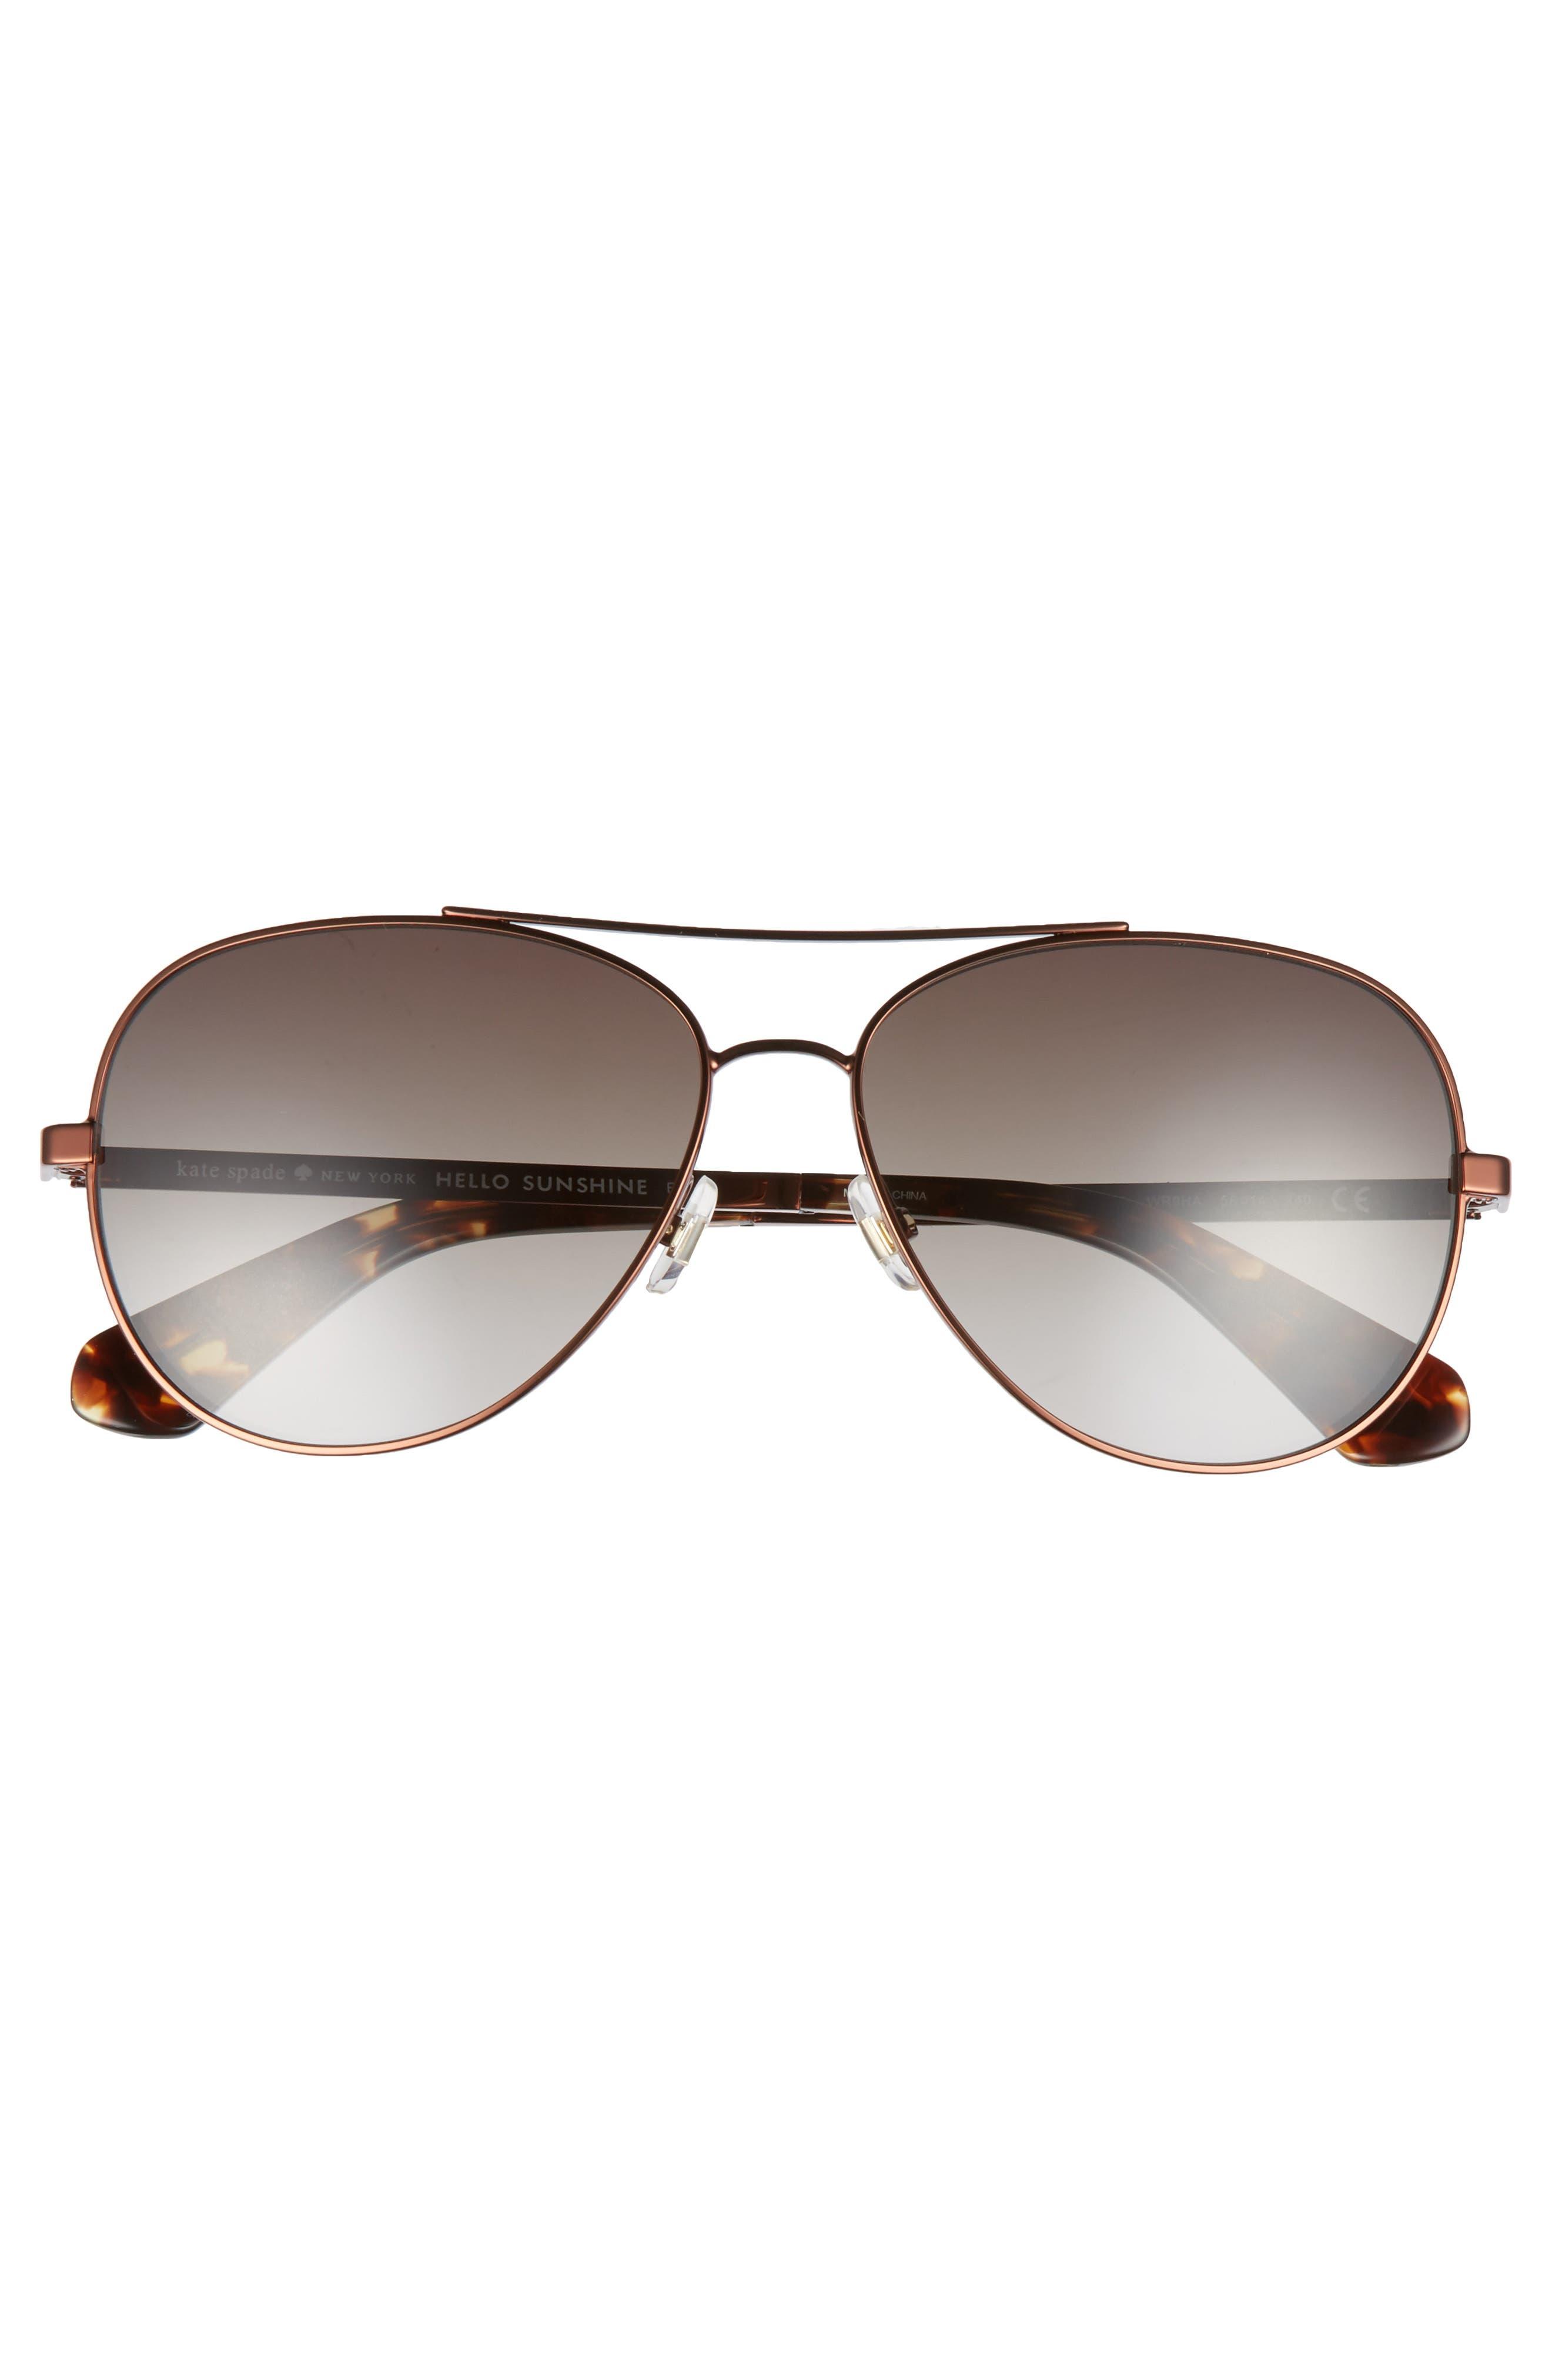 avaline 58mm aviator sunglasses,                             Alternate thumbnail 3, color,                             BROWN HAVANA